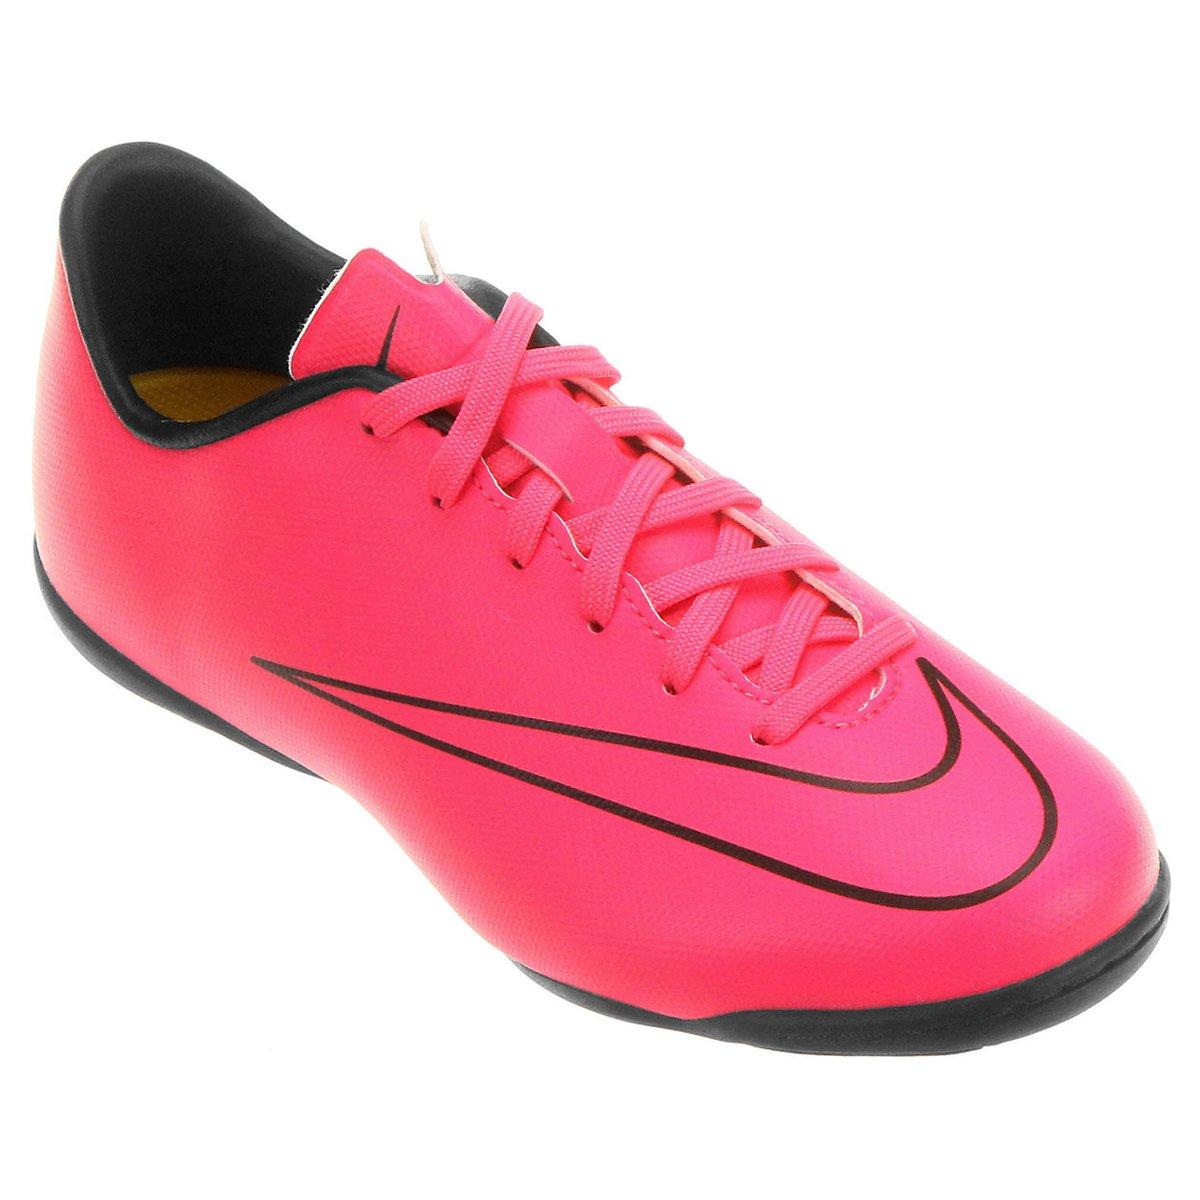 Retro Running Shoes